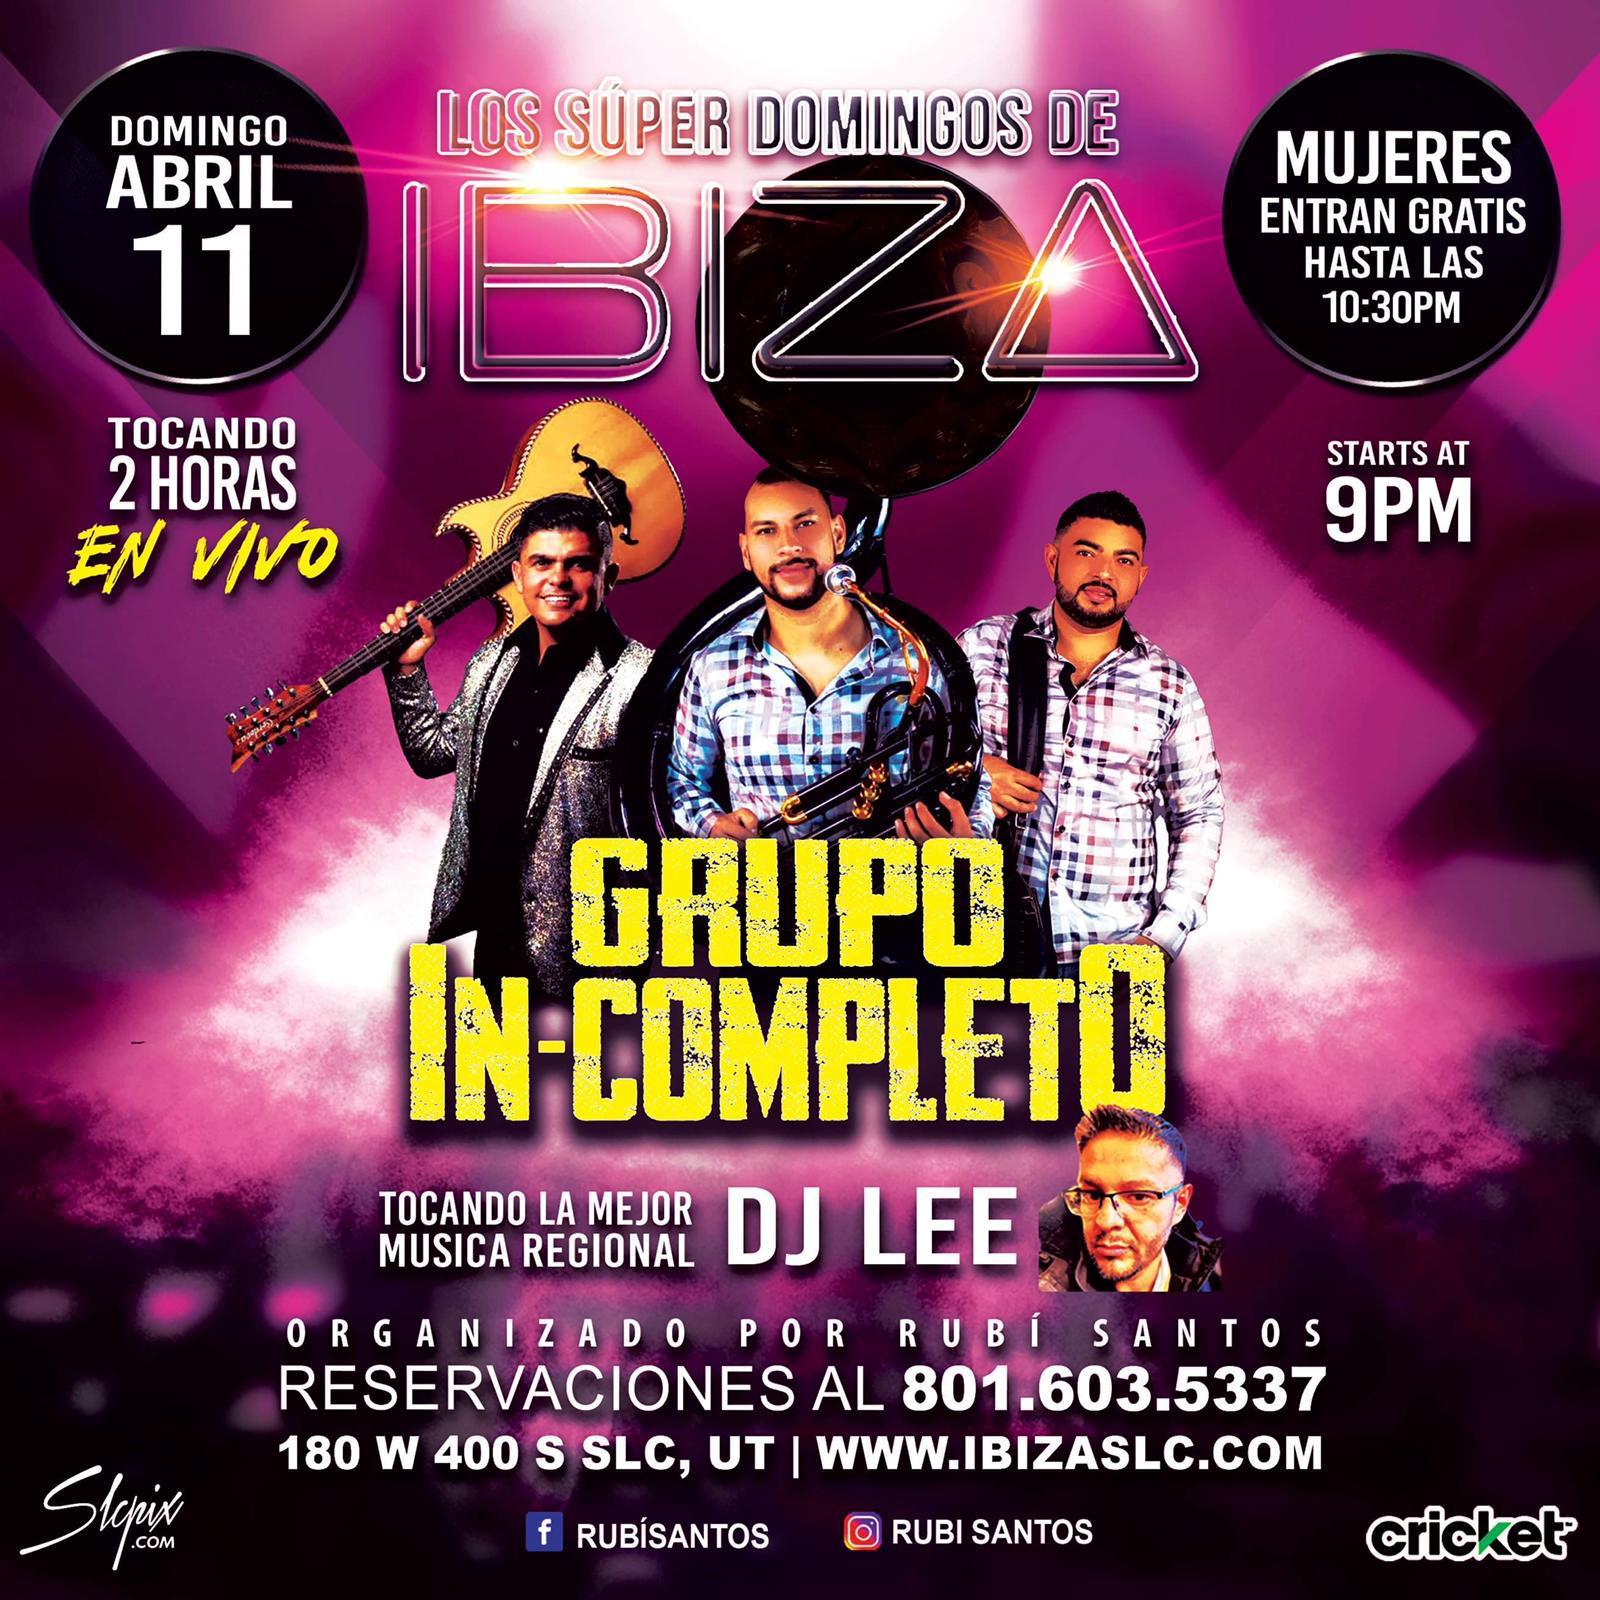 Super Domingos De Ibiza - Grupo In-Compl